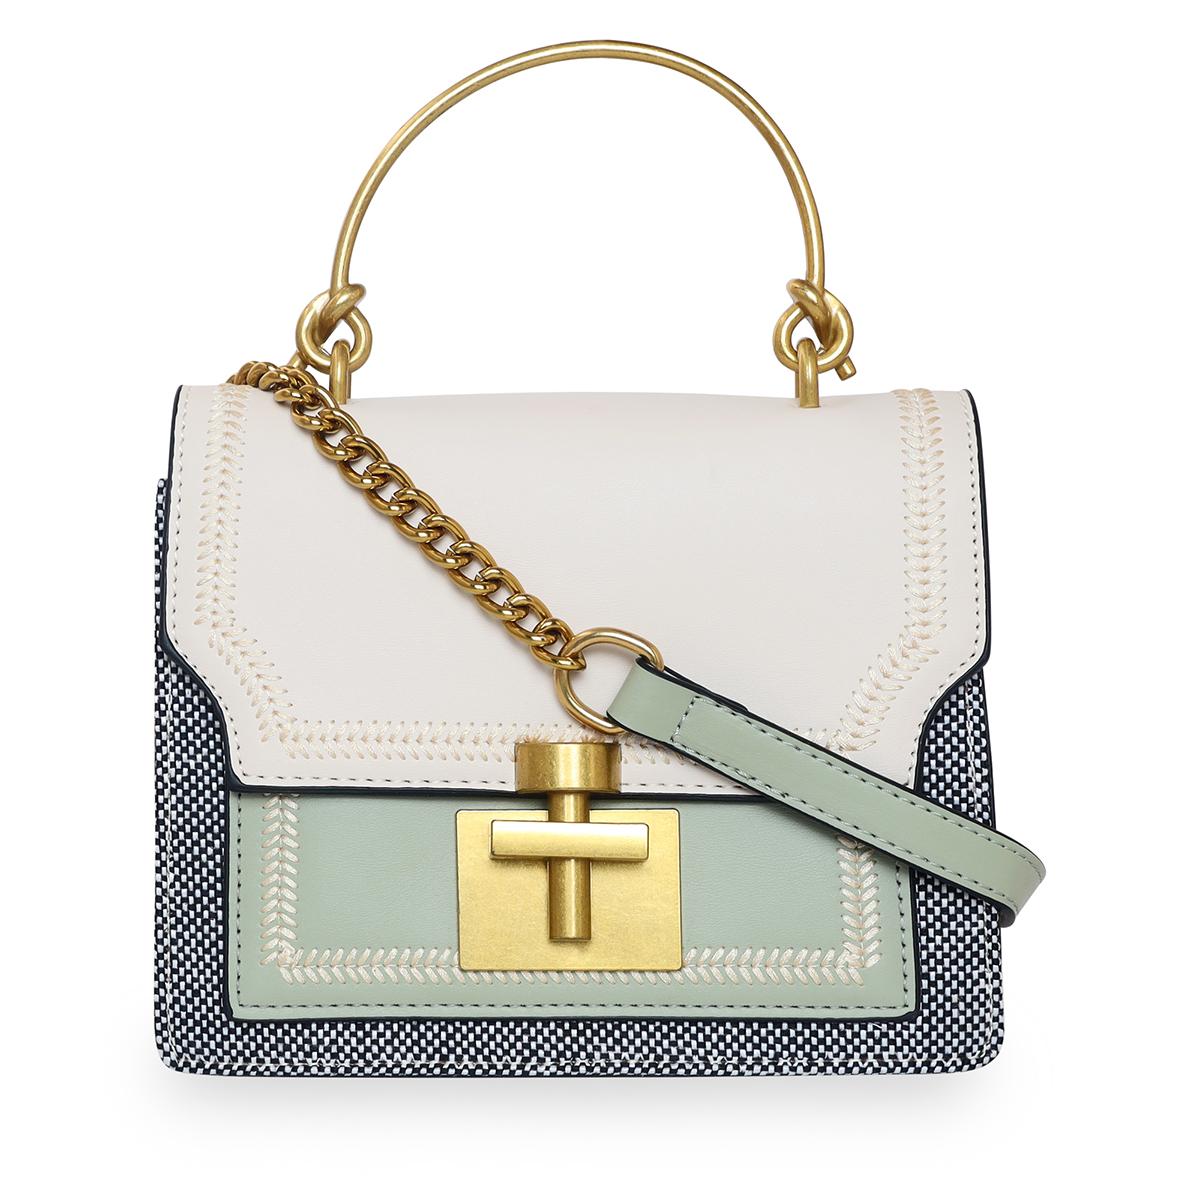 ESBEDA | ESBEDA Cream - Pista Color Solid Pattern Crossbody Box Mini Handbag For Women